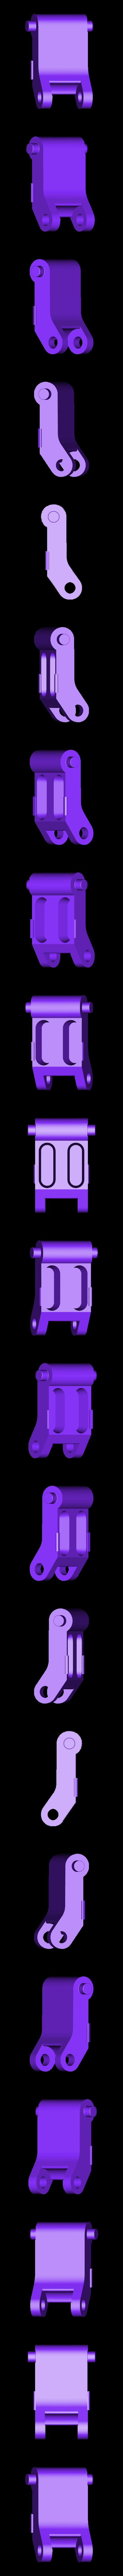 side Probe2.stl Download STL file Humminbird 525 echo sounder • Template to 3D print, francknos